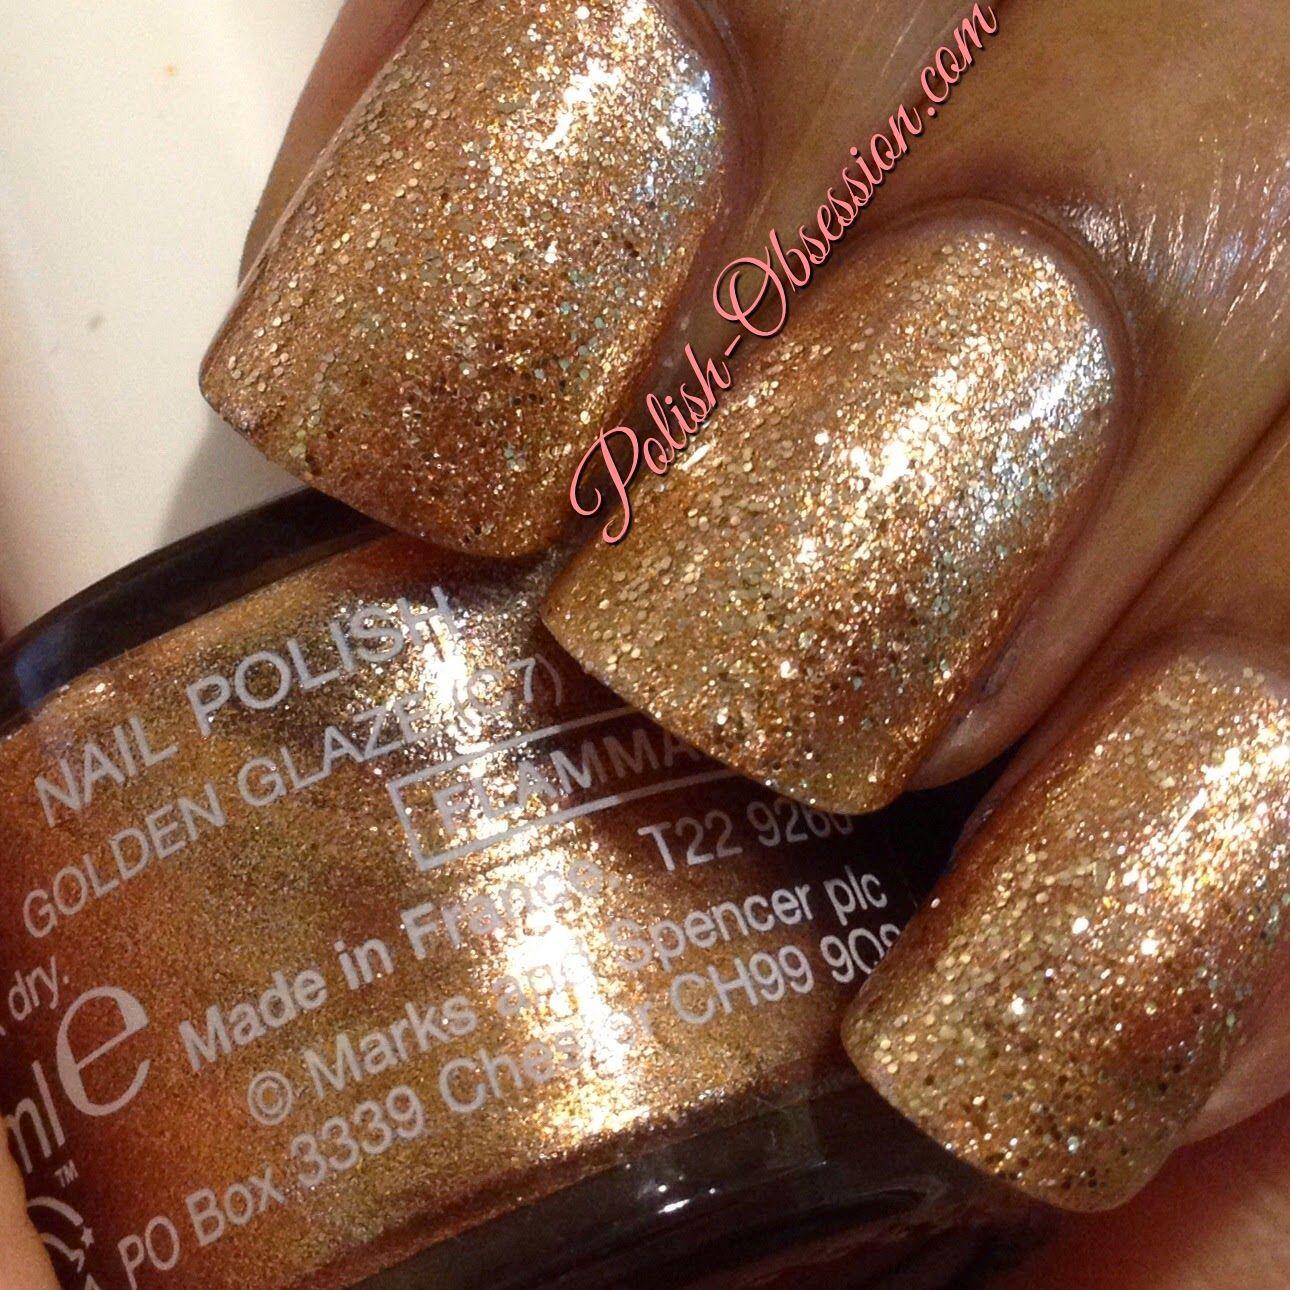 Marks And Spencer Golden Glaze Nail Polish Golden Nails Marks And Spencer